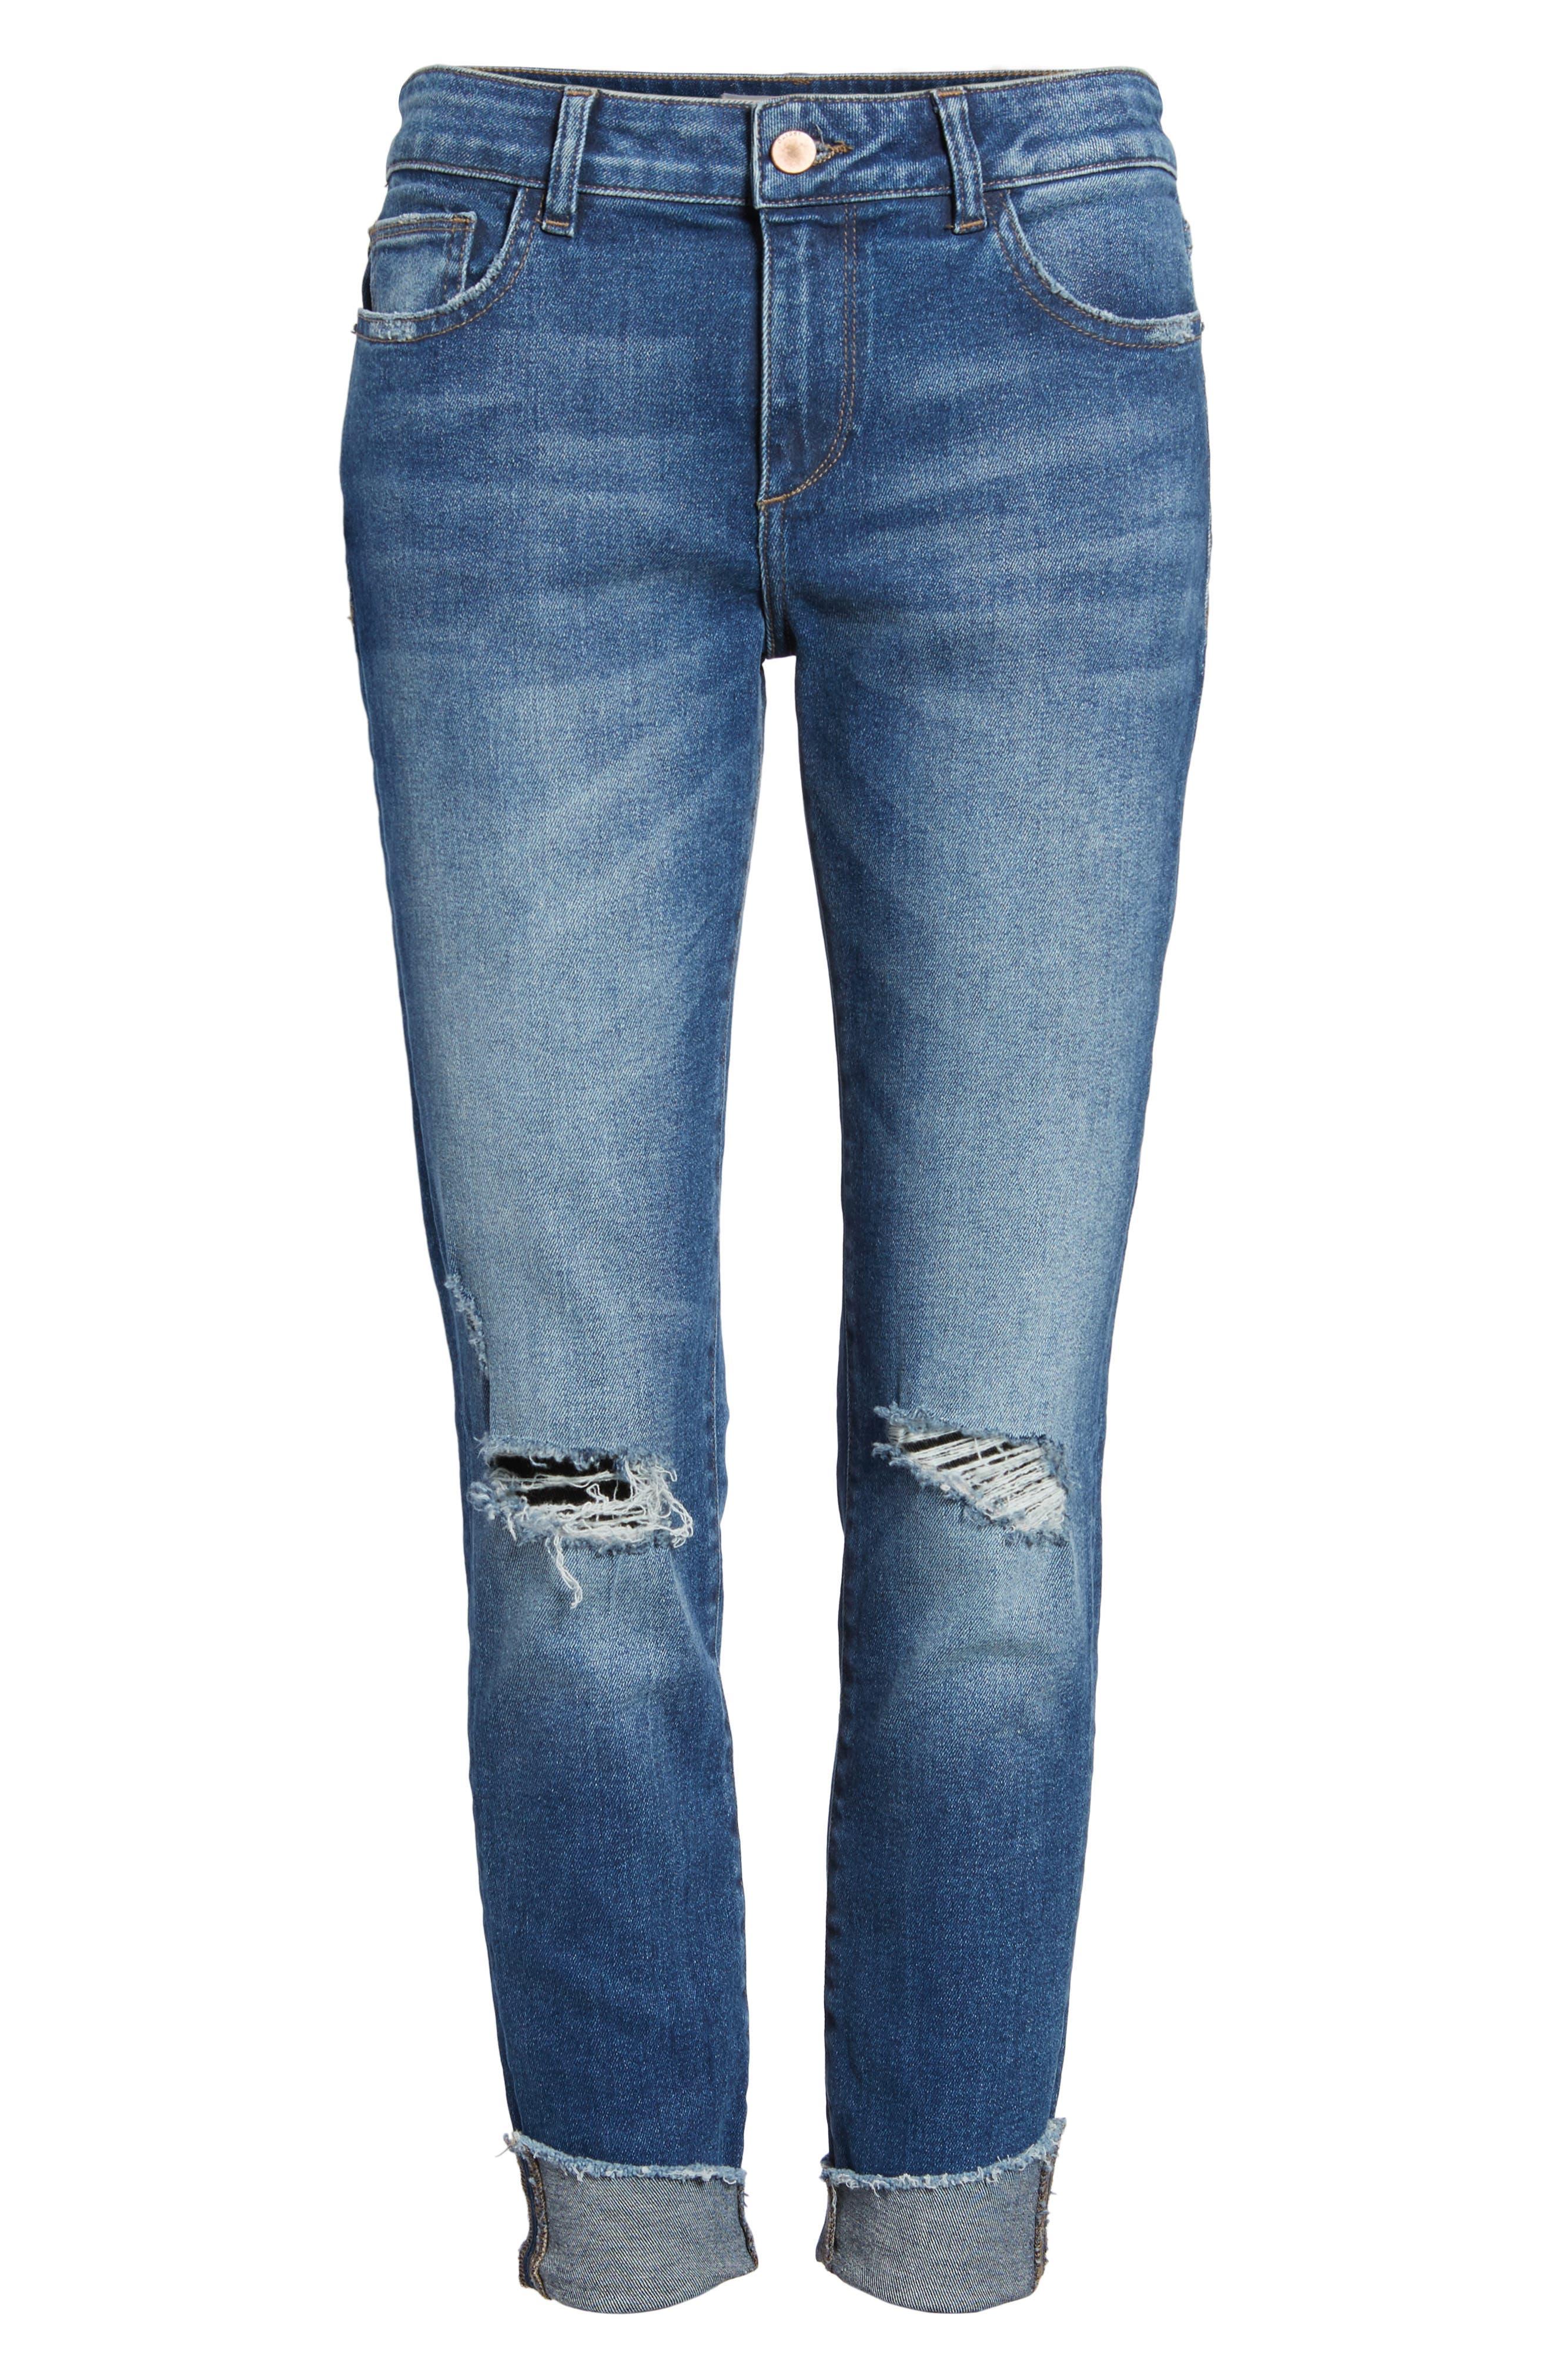 Florence Instasculpt Crop Skinny Jeans,                             Alternate thumbnail 6, color,                             400